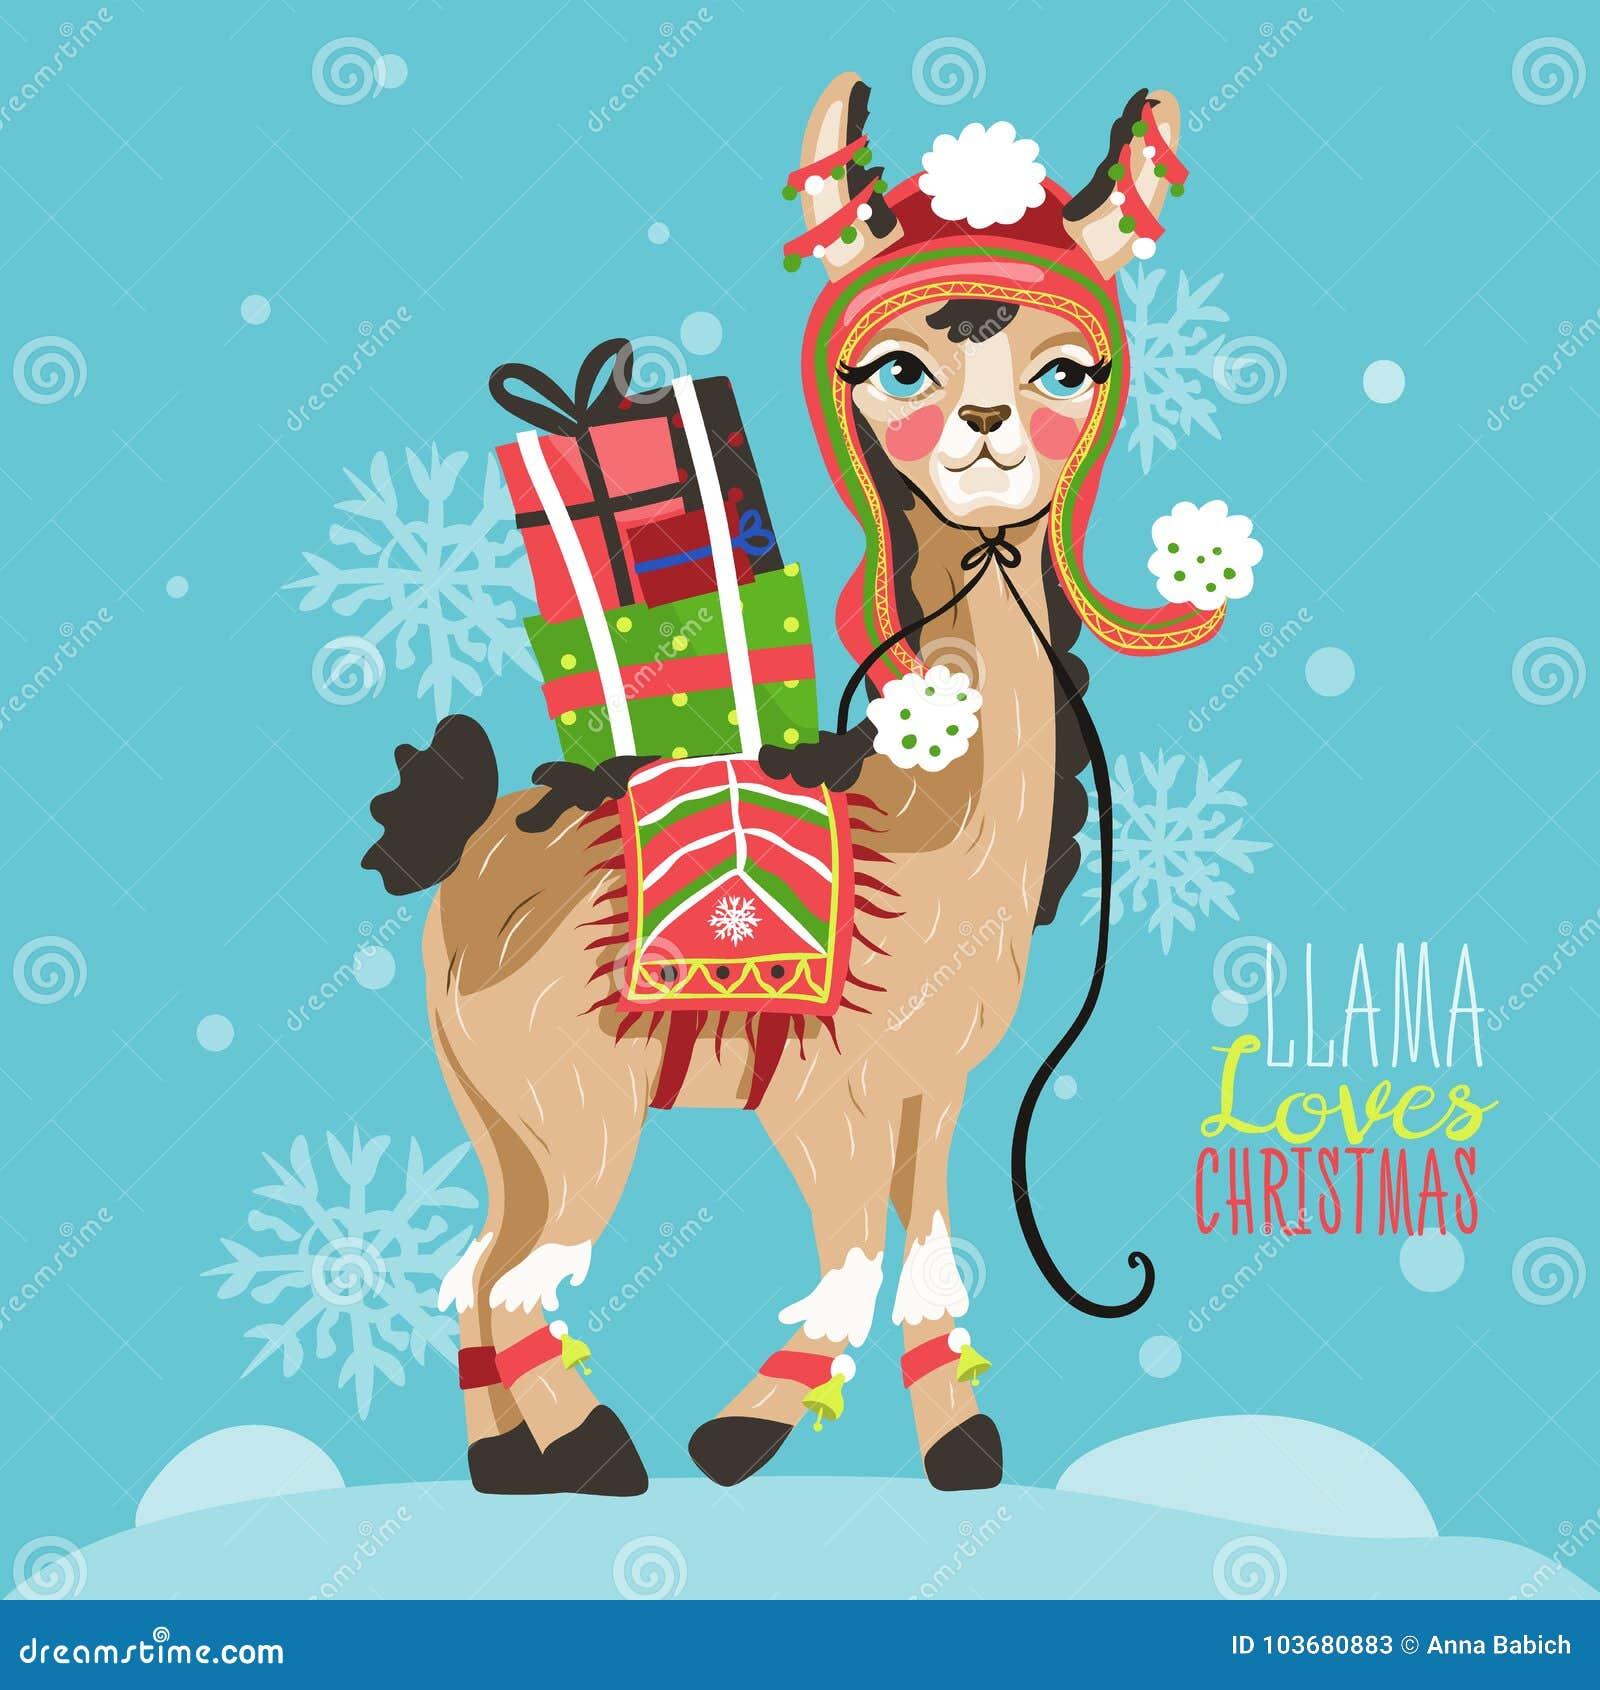 Llama Christmas.Merry Christmas Funny Card With Llama Stock Vector